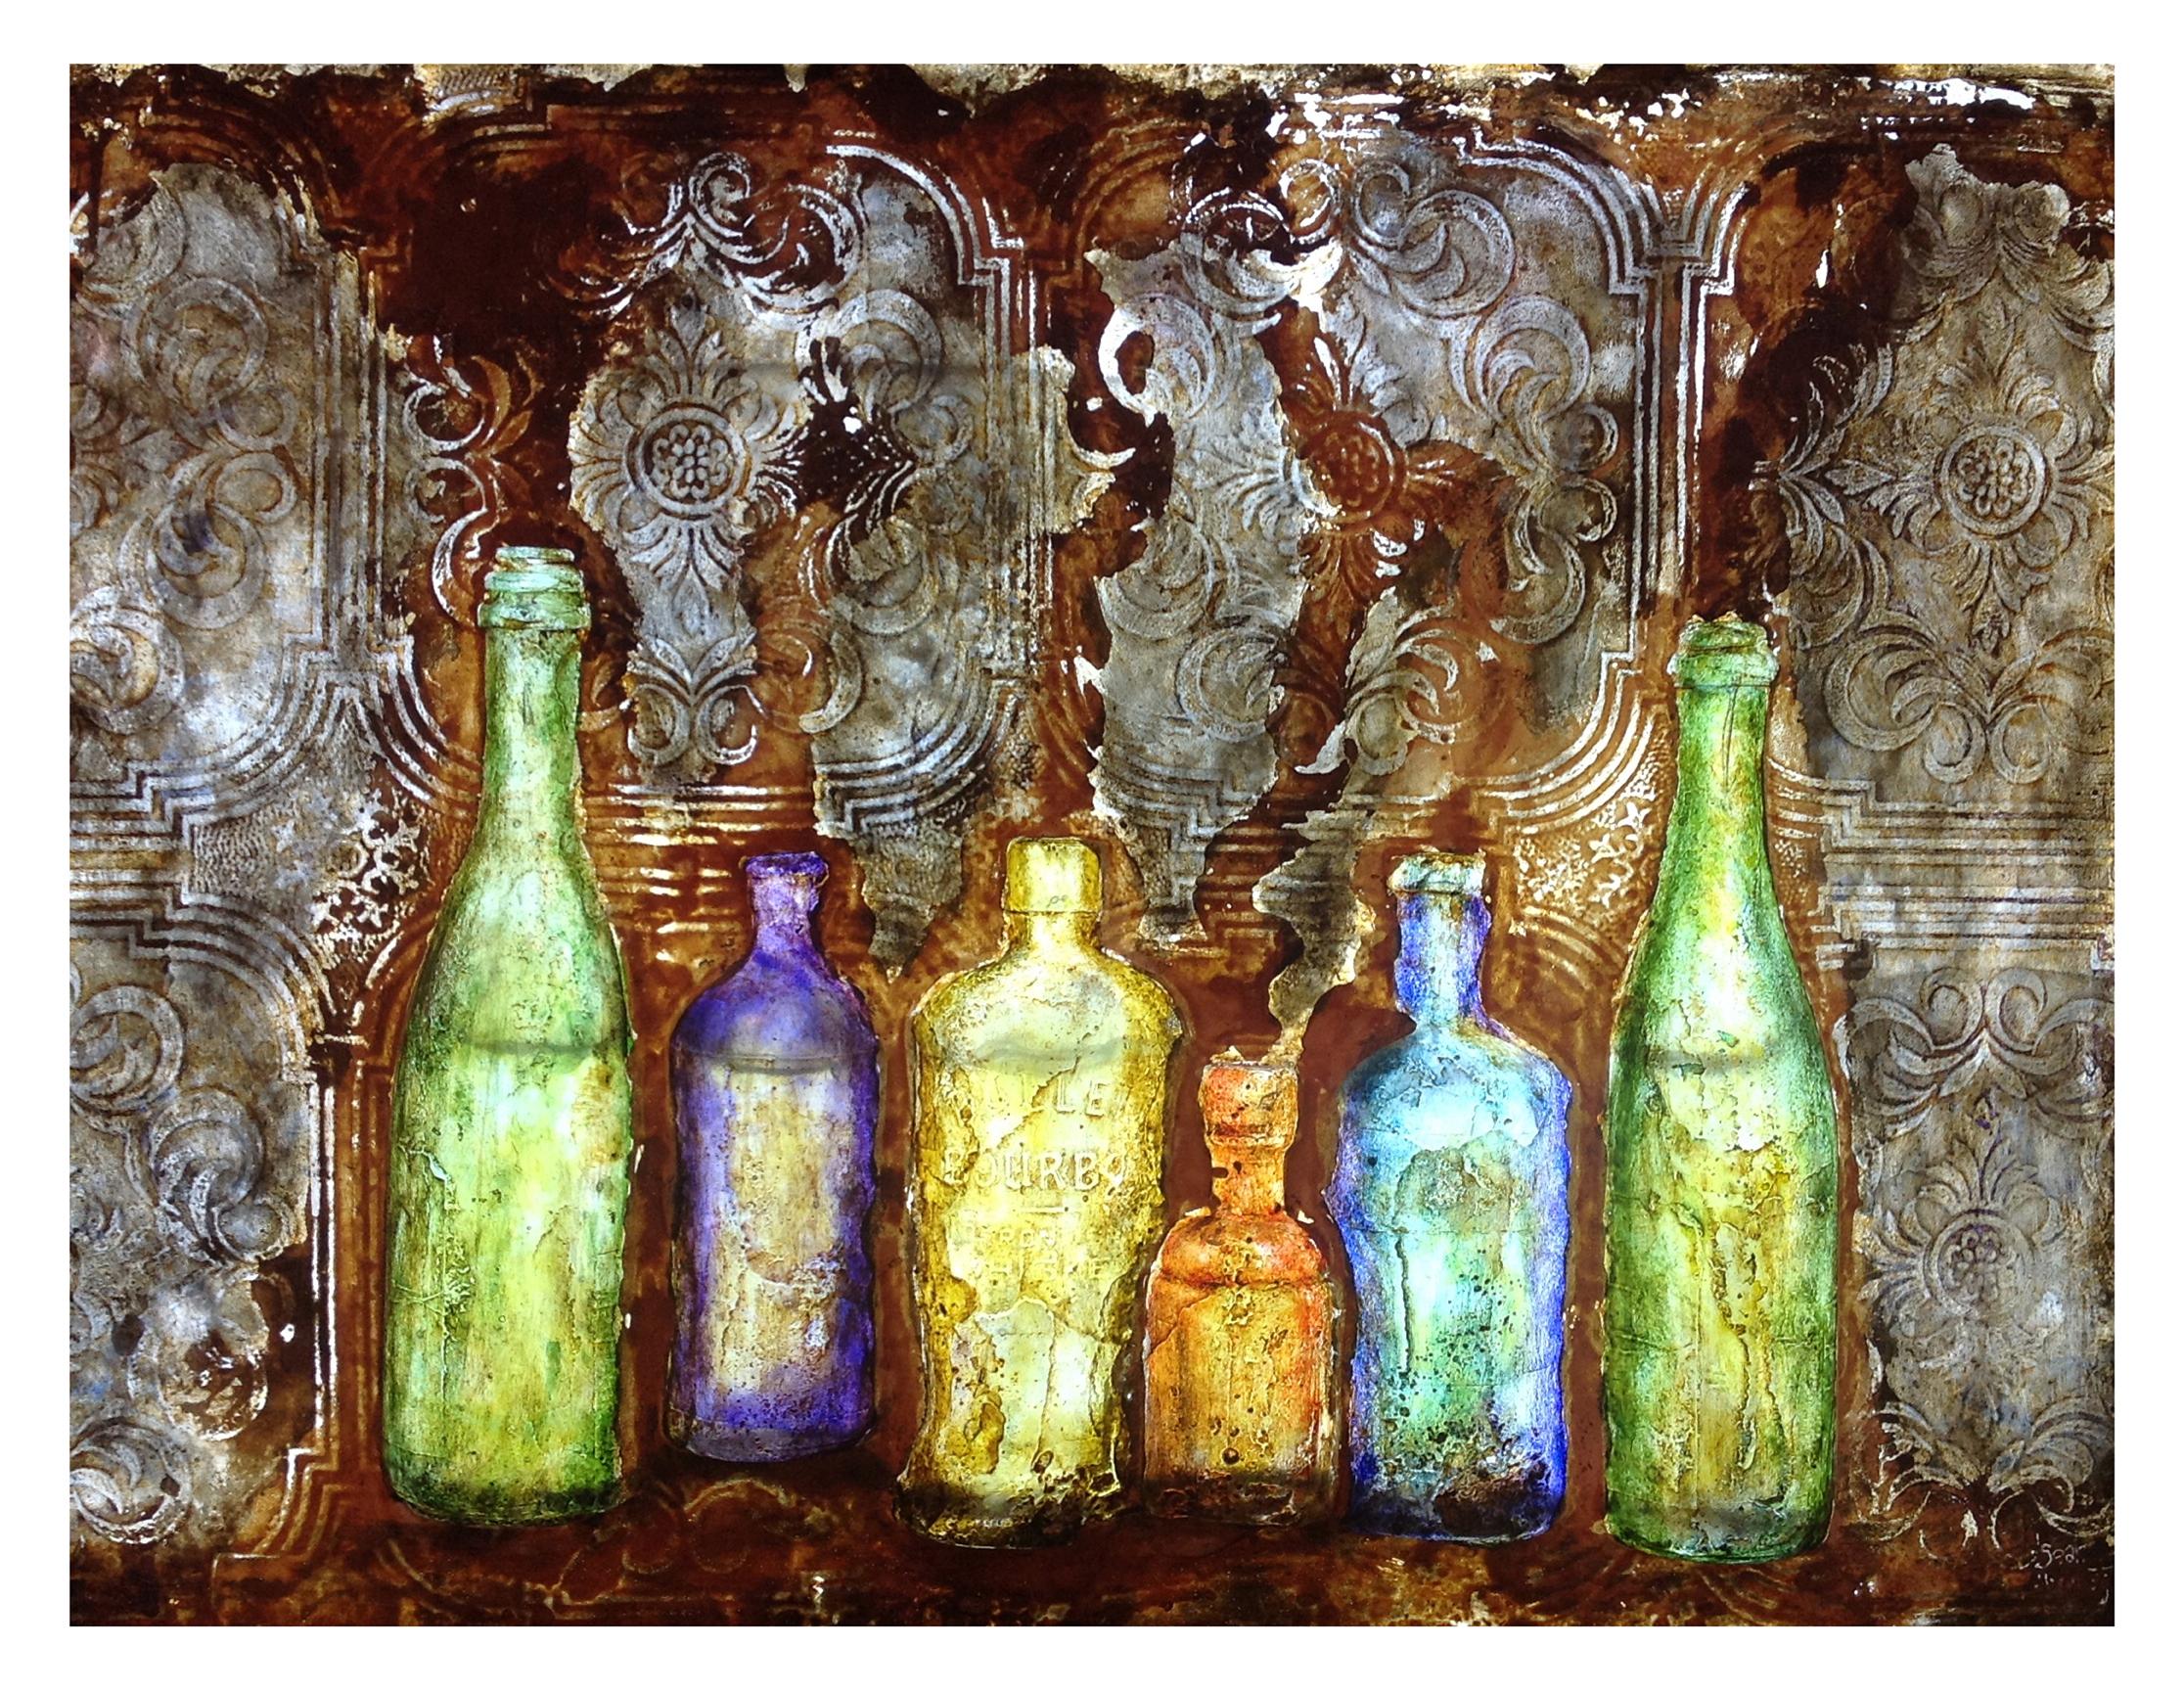 Bottles of Old Dreams